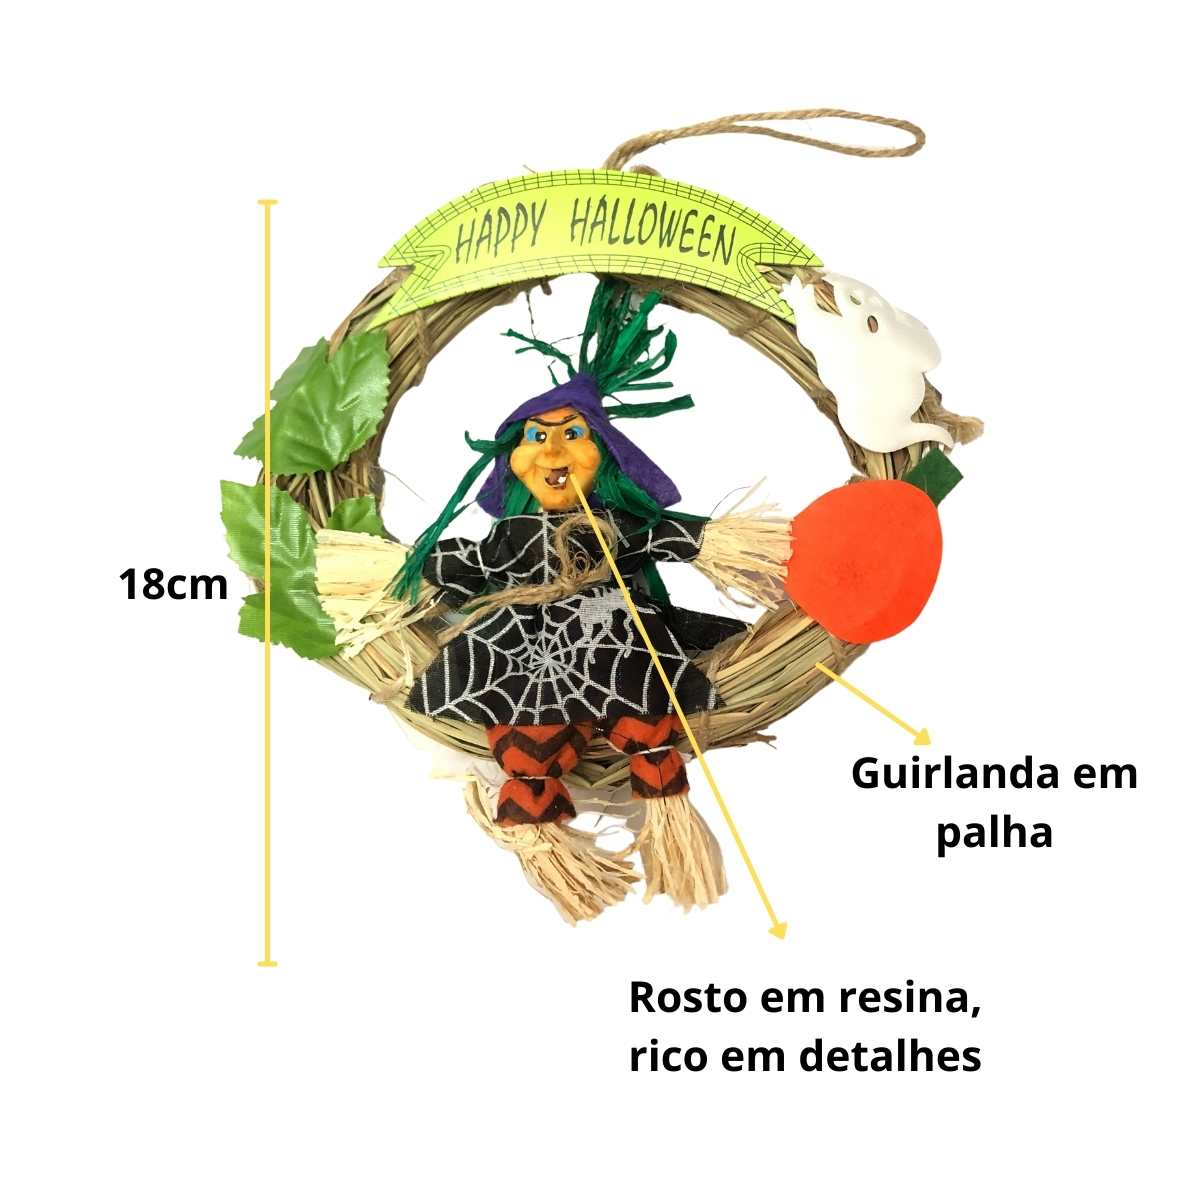 Guirlanda Redonda Bruxa 18cm